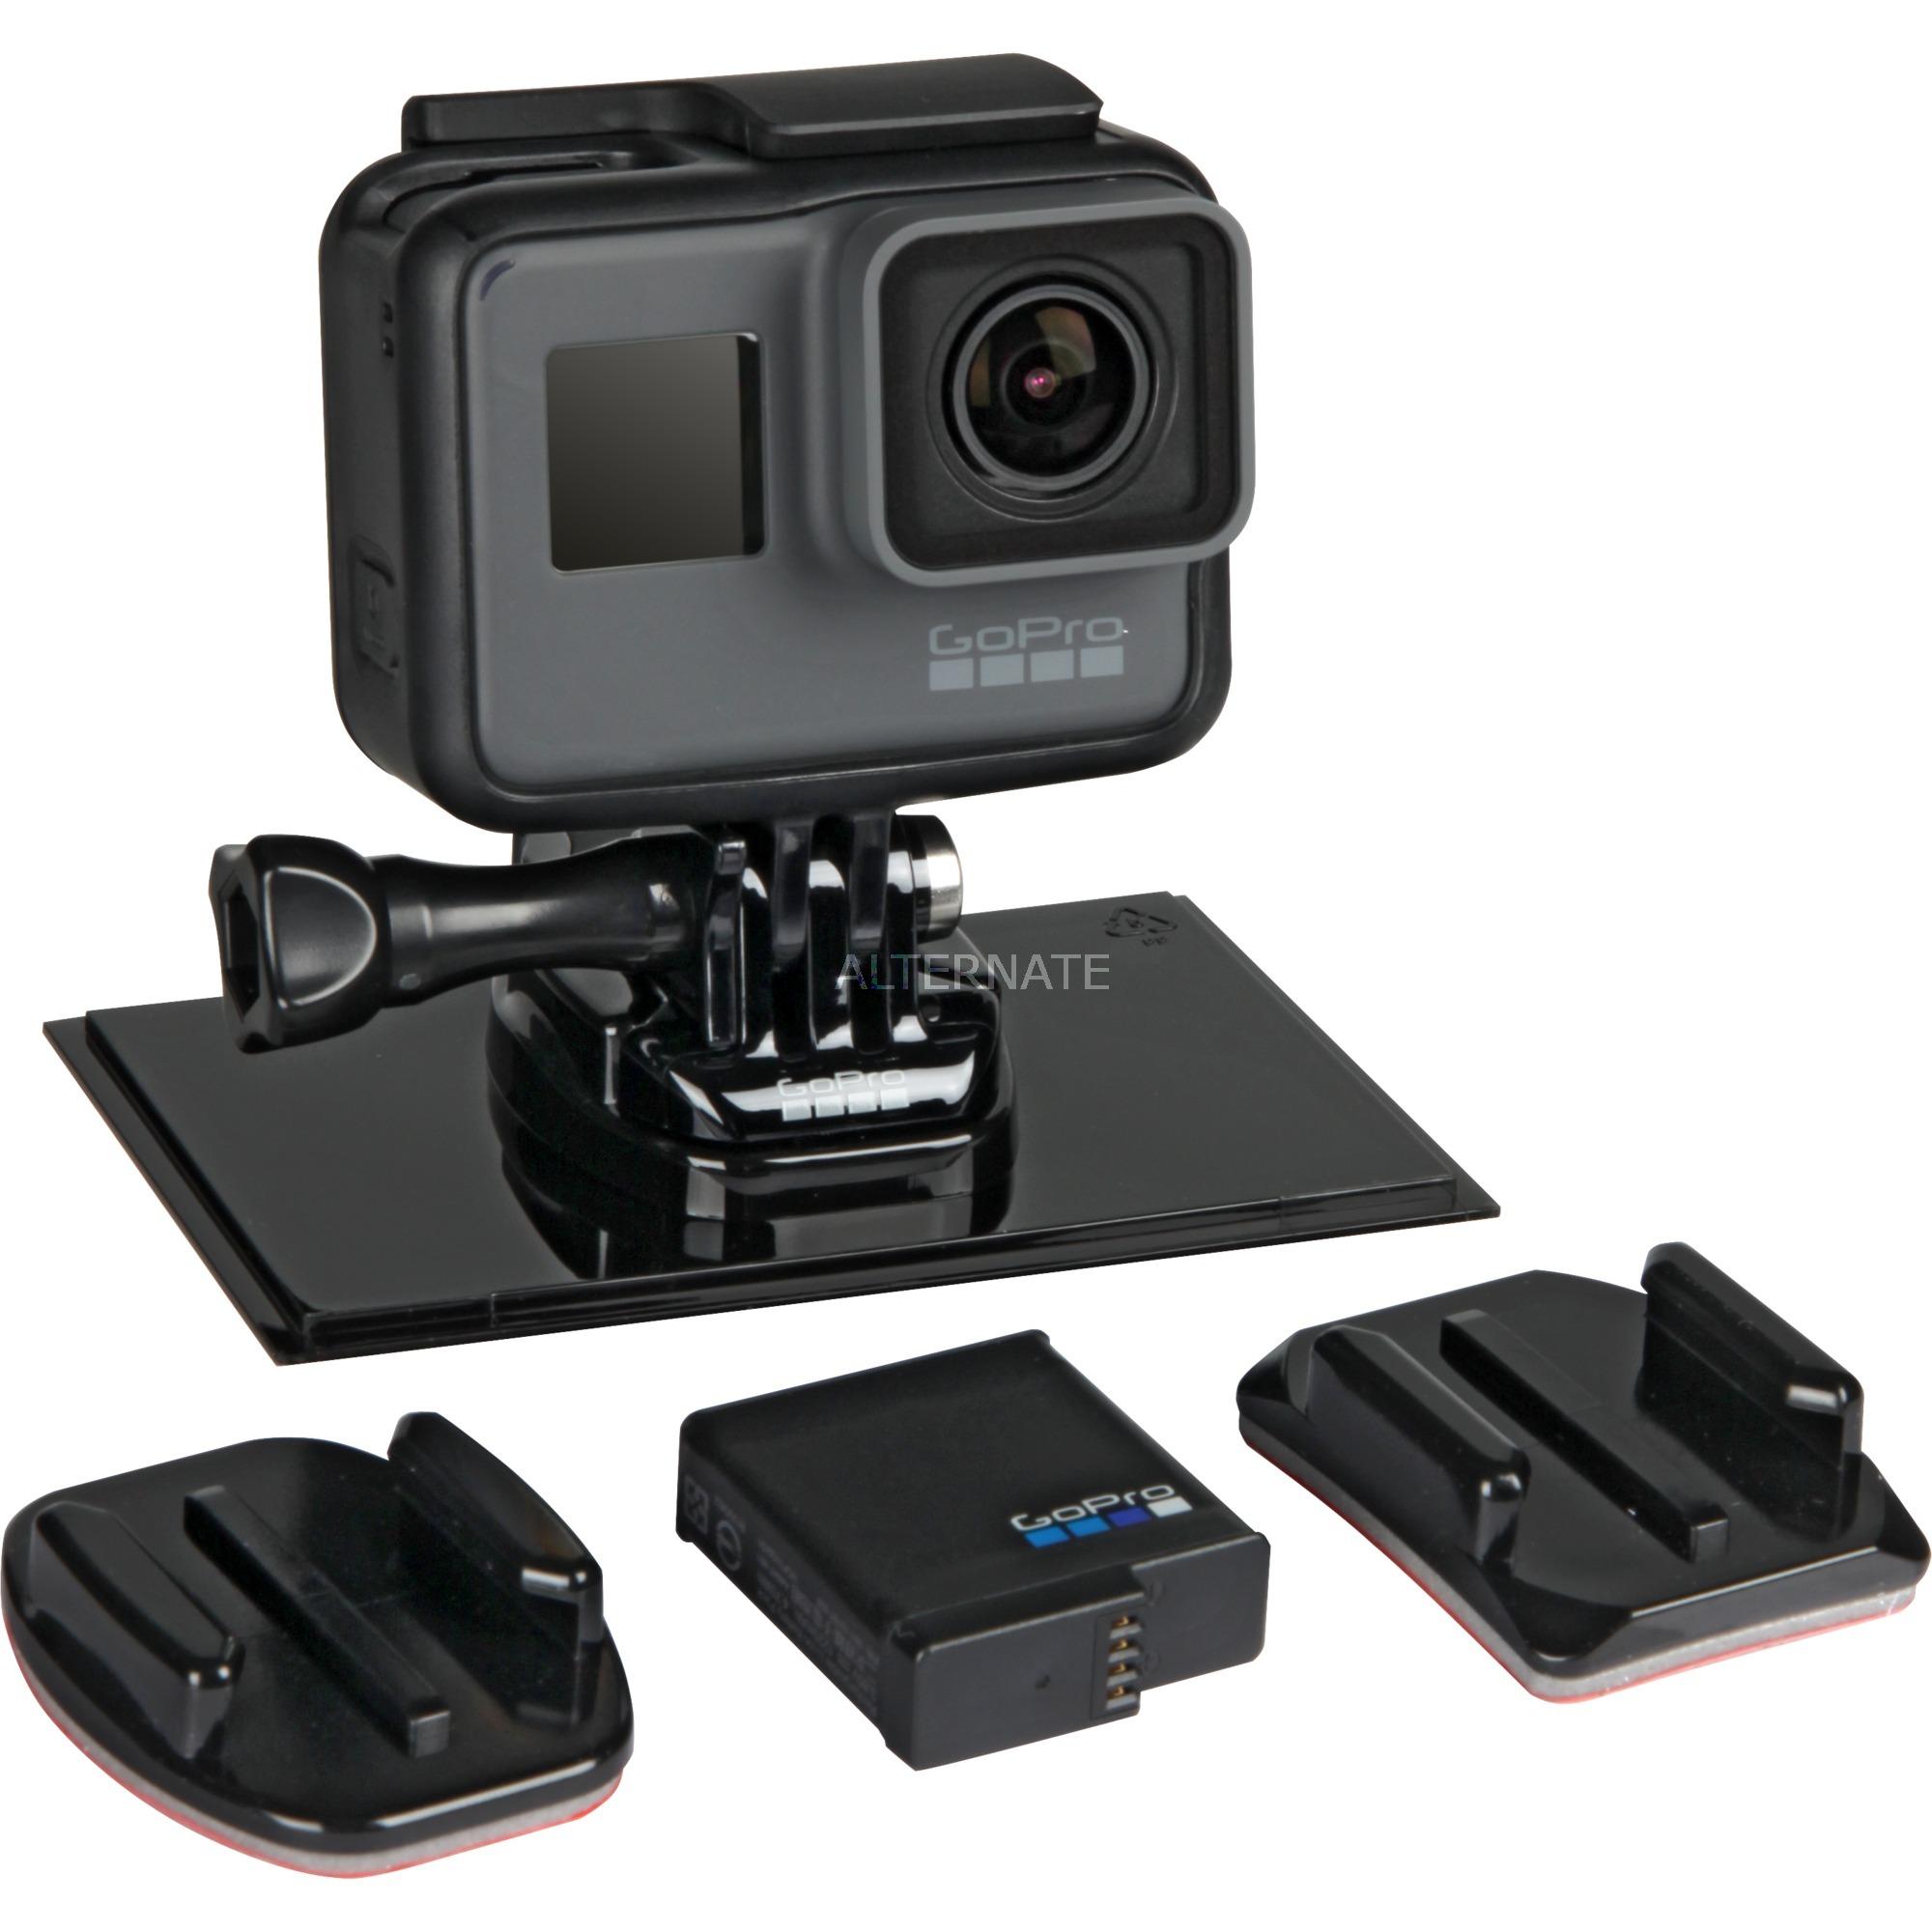 HERO5 Black 12MP 4K Ultra HD Wifi cámara para deporte de acción,...